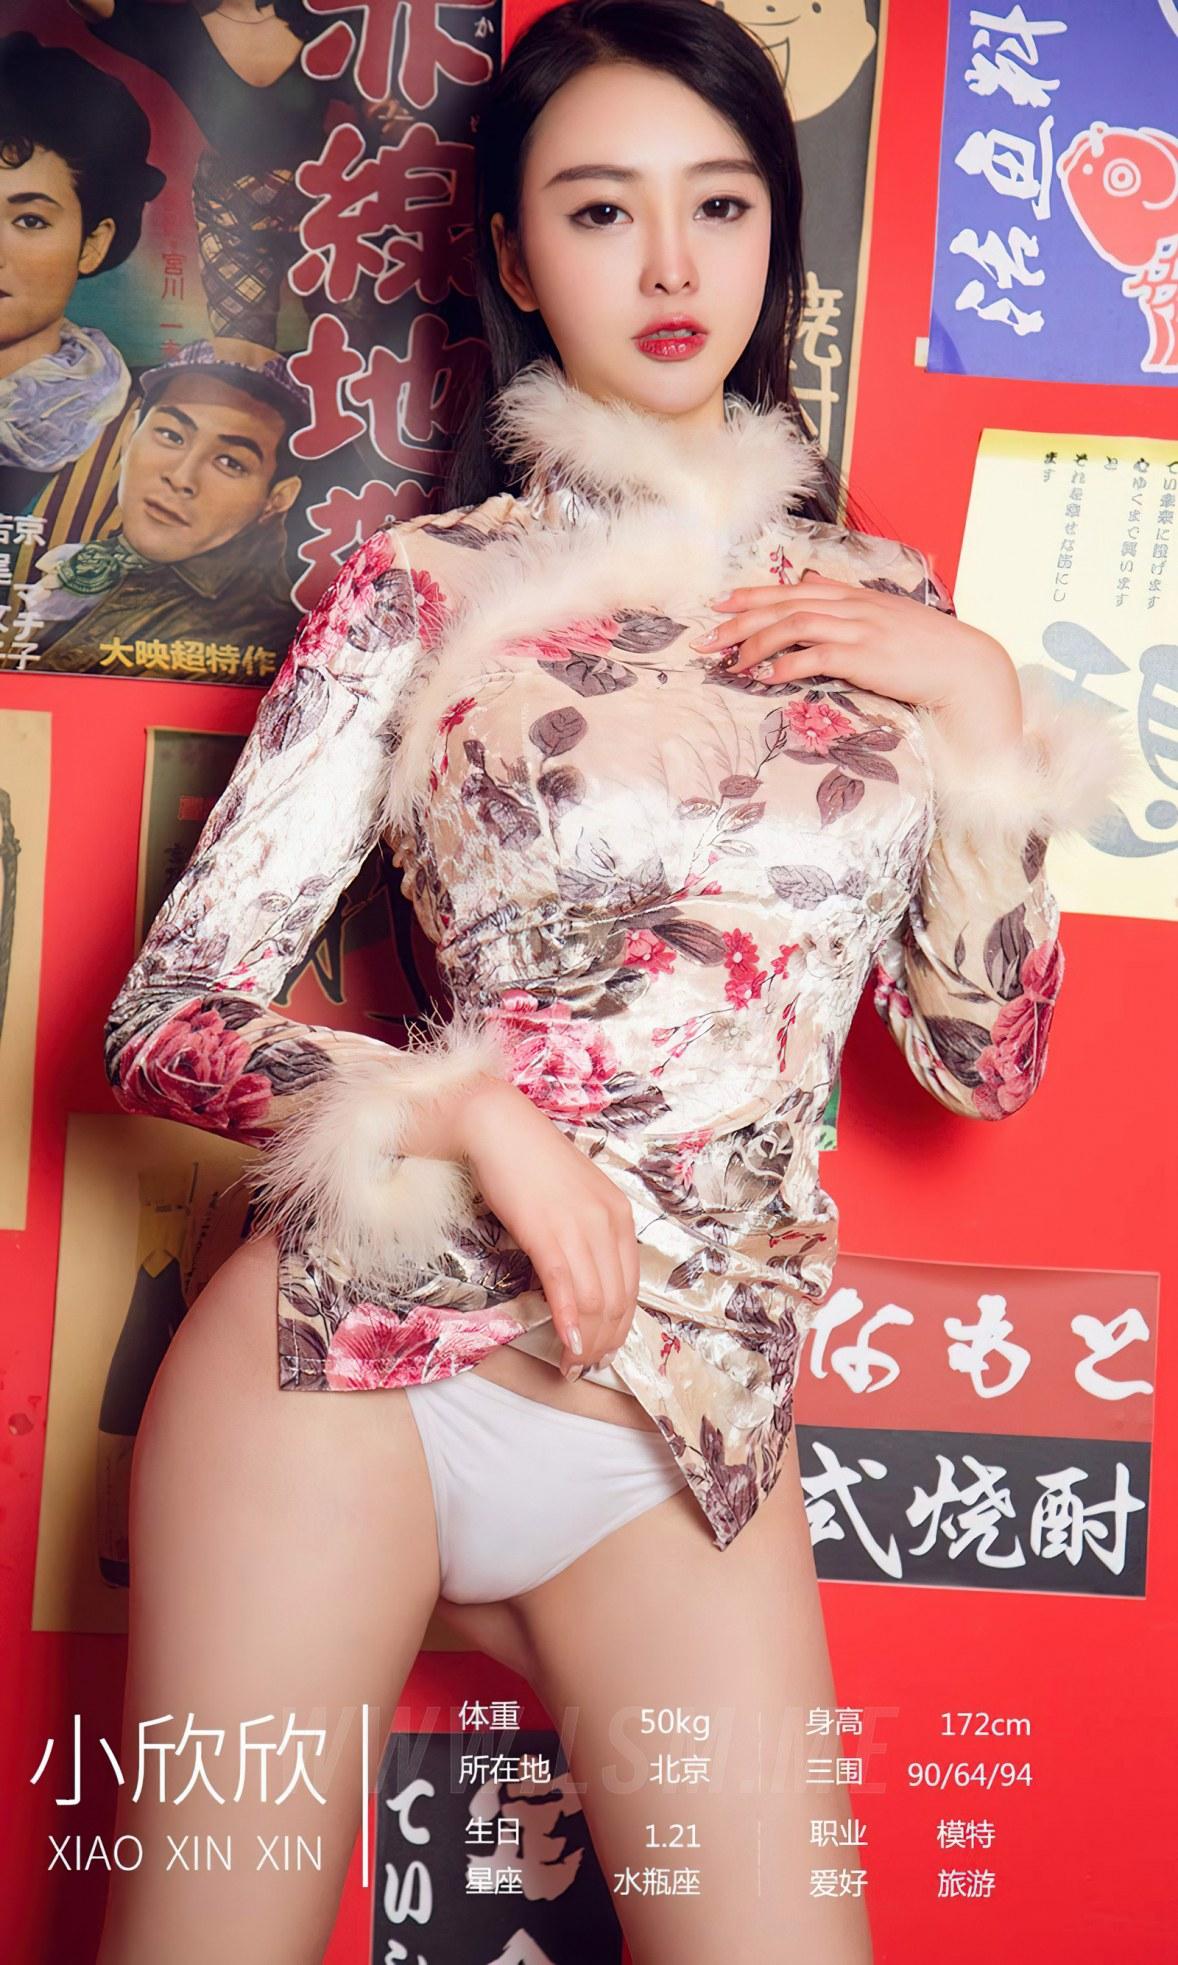 UGirls 爱尤物 No.2128 魅惑众生 模特合辑 - 4